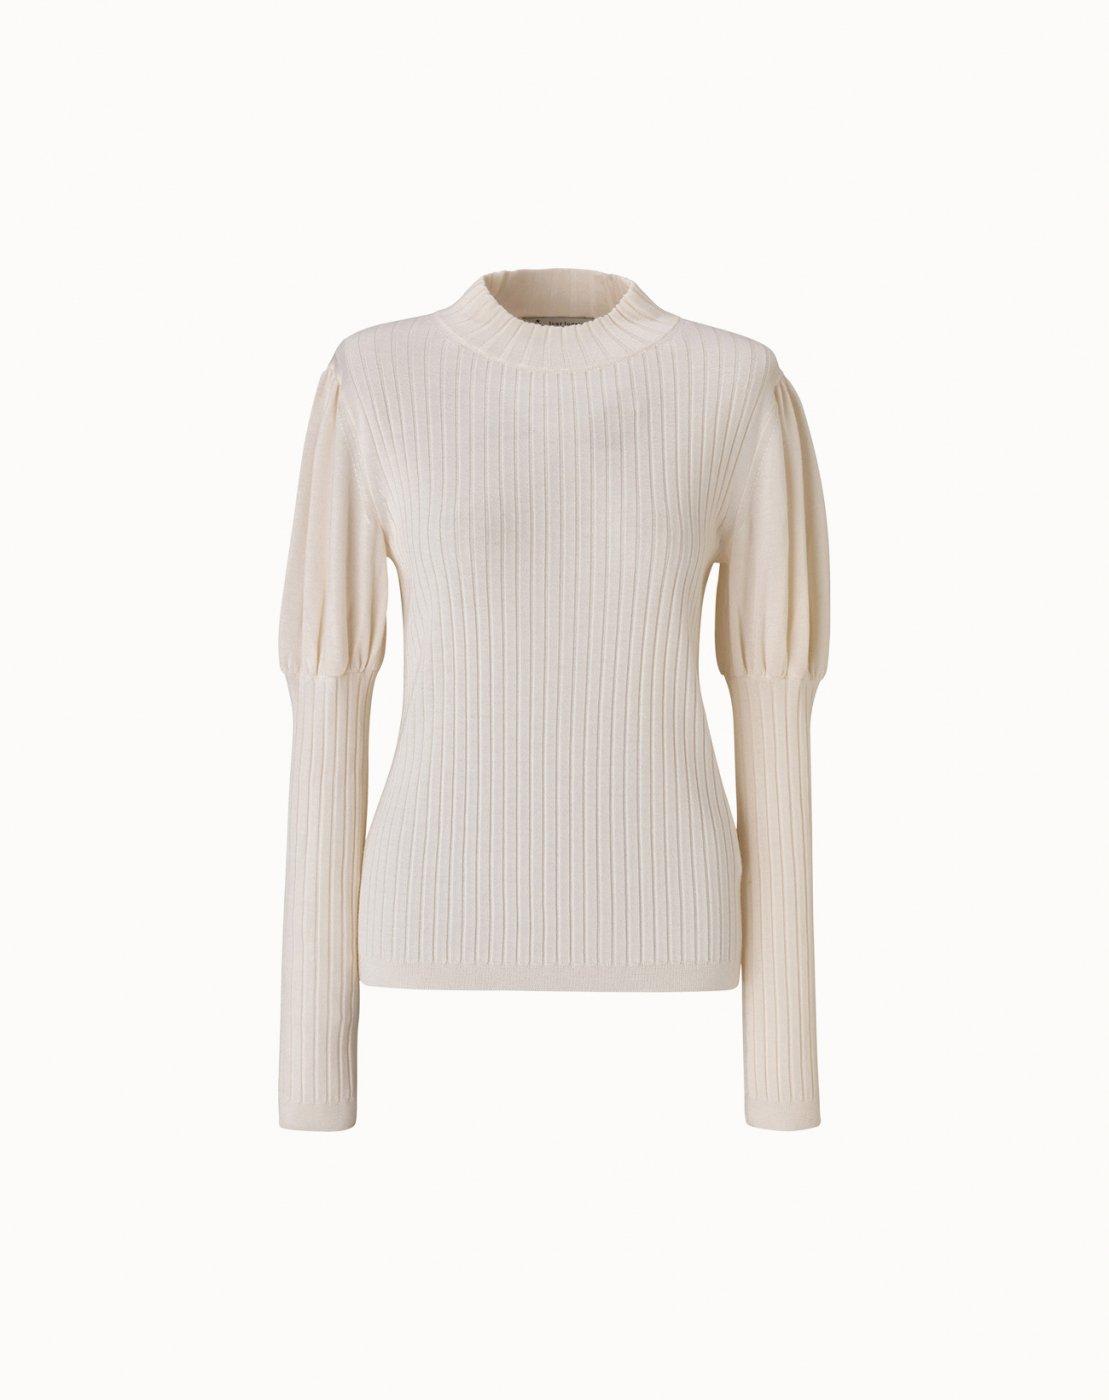 leur logette - Cashmere Silk Rib Top - Off White